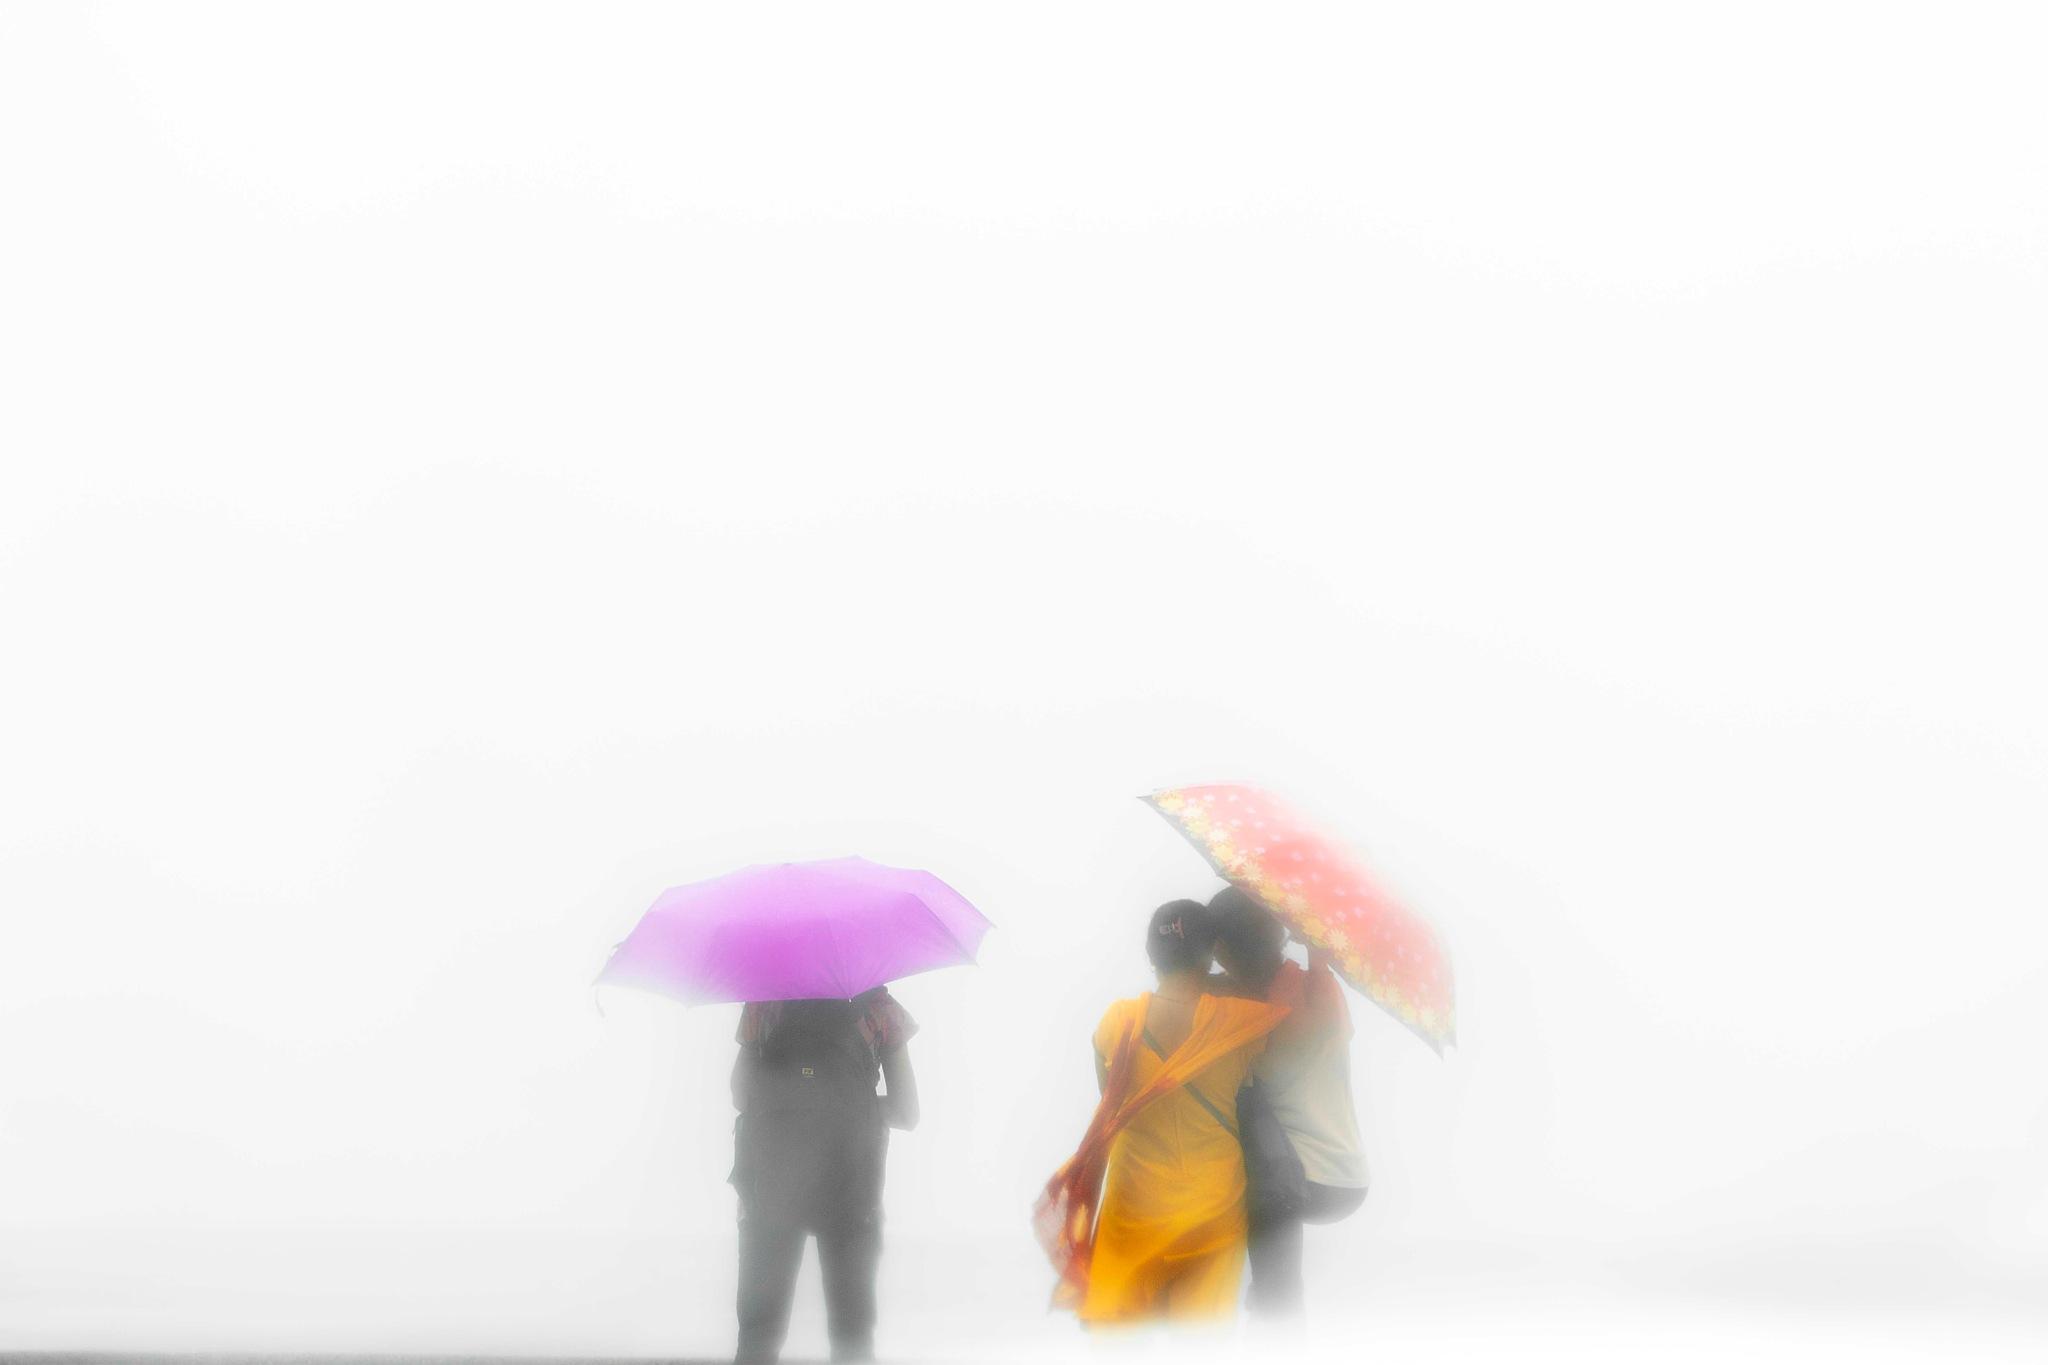 Whiteout by Vikas Datta